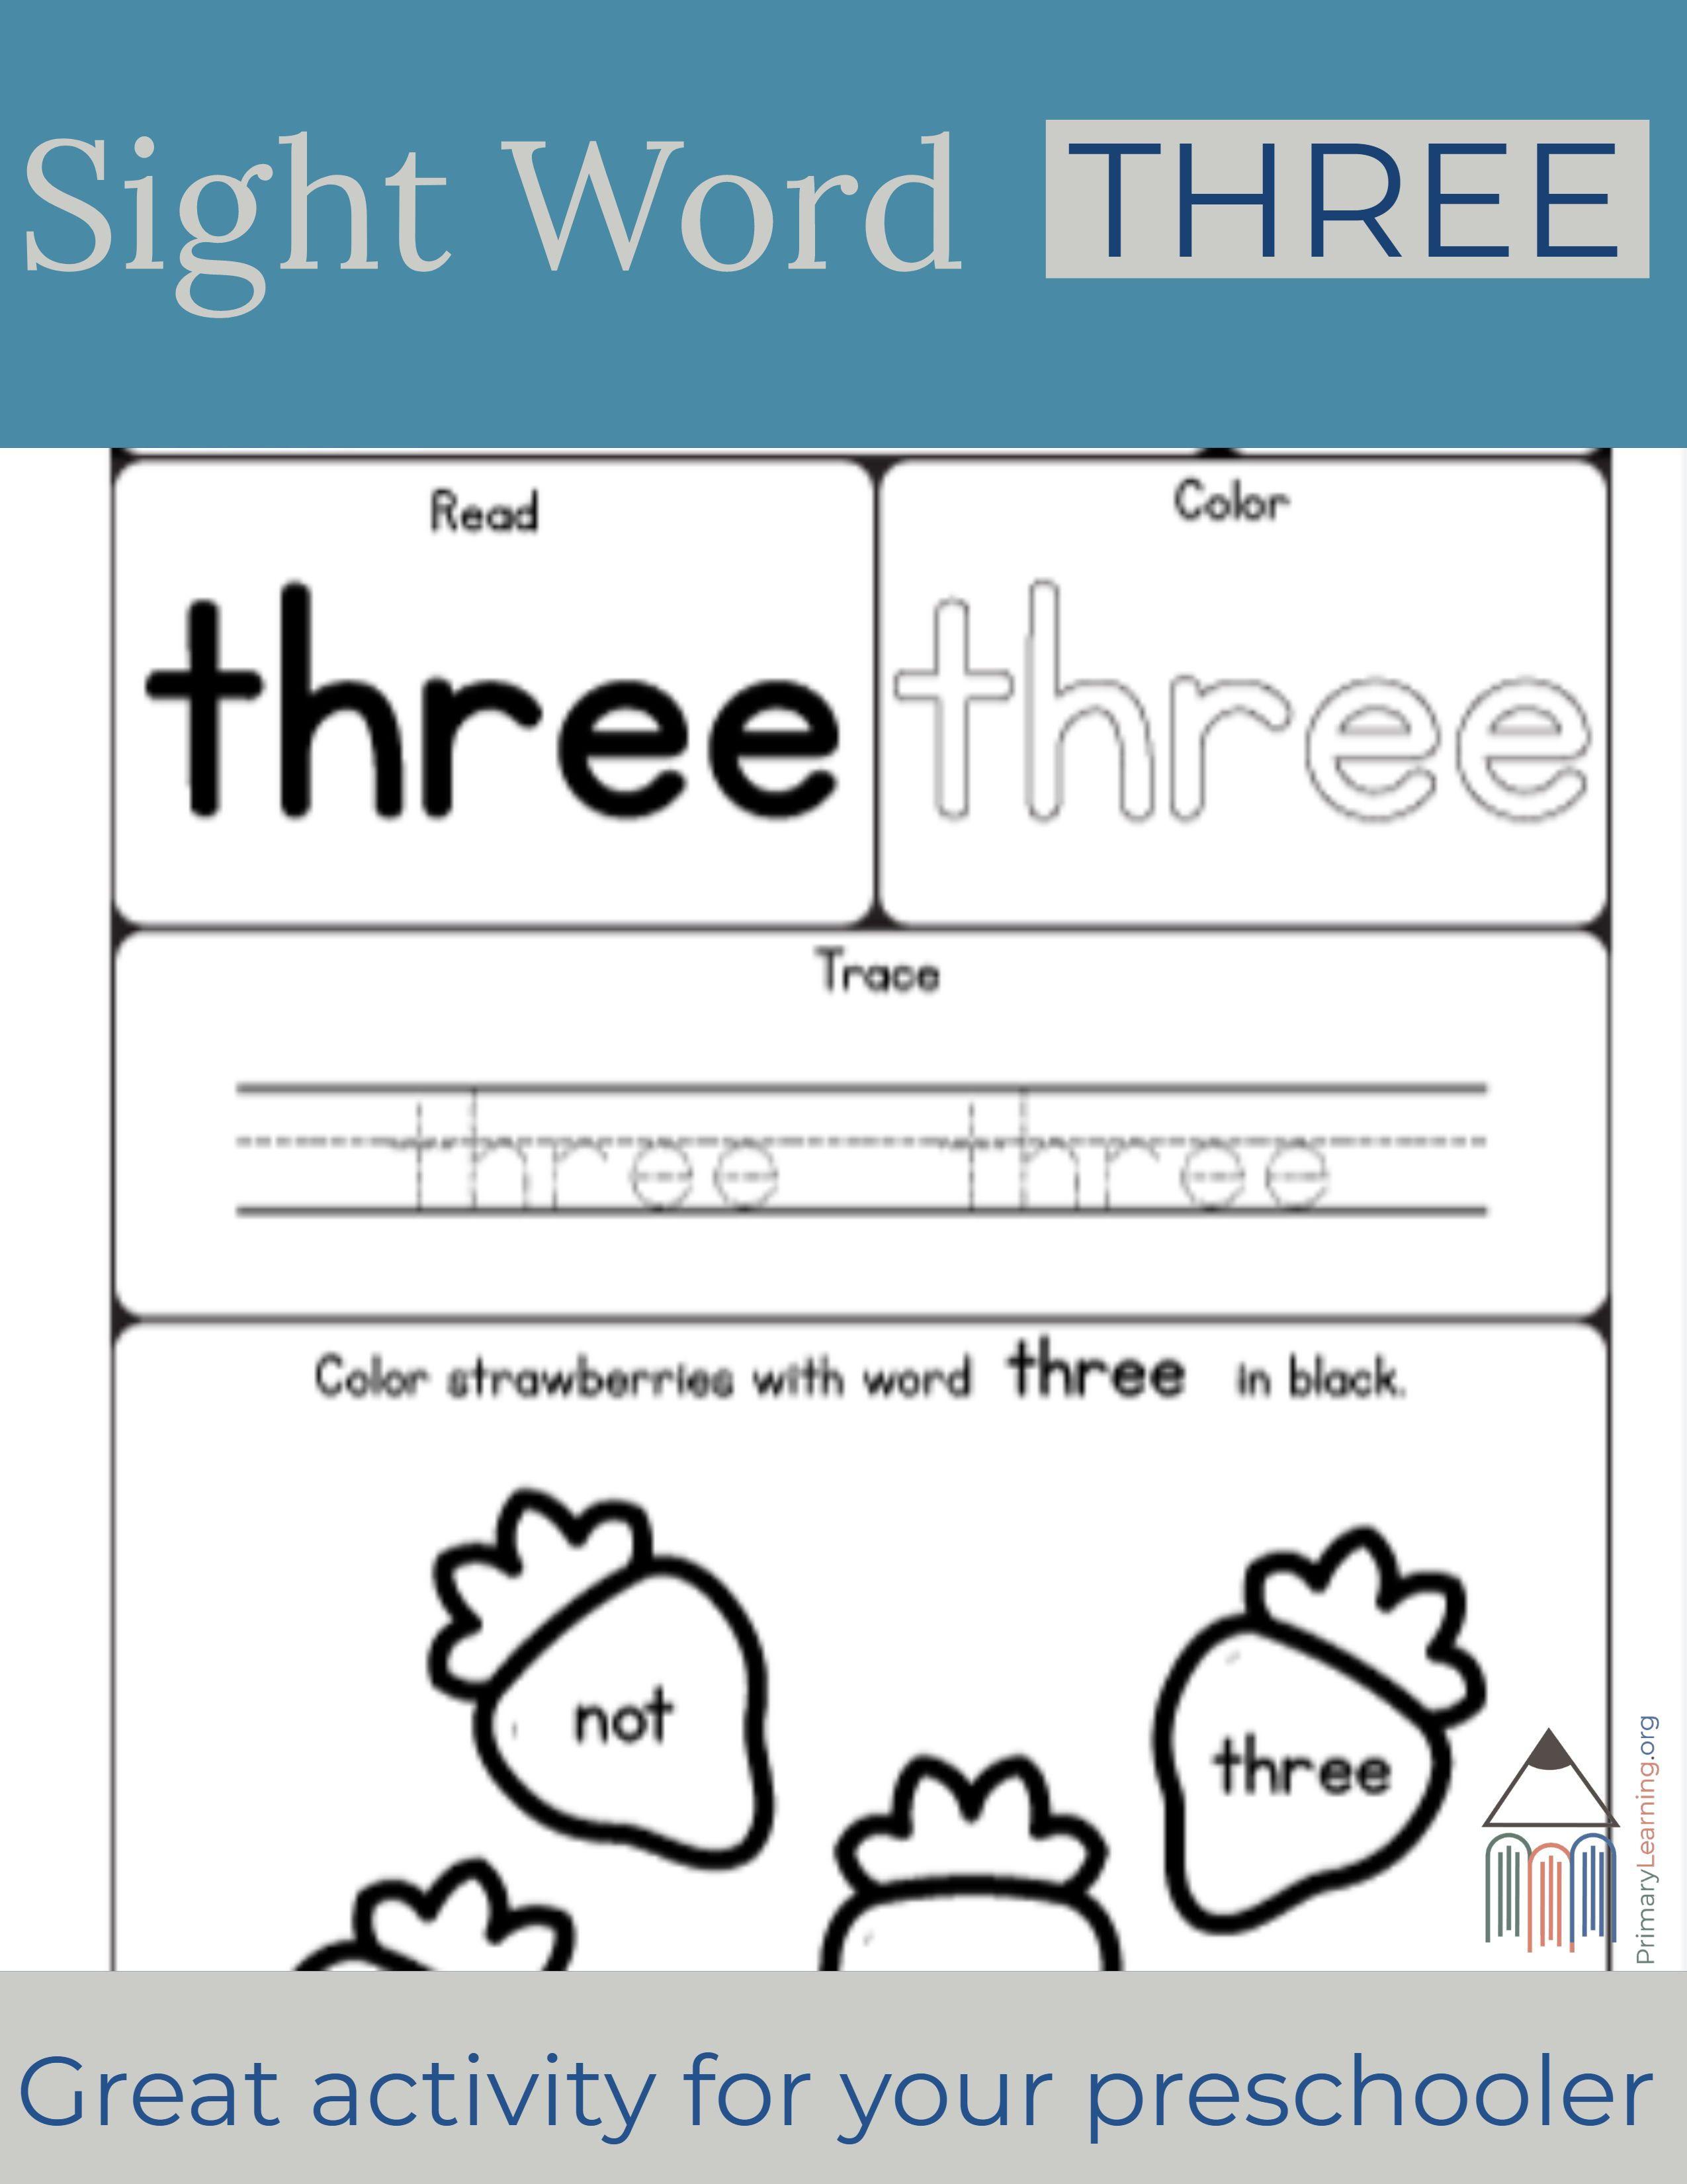 Sight Word Three Worksheet